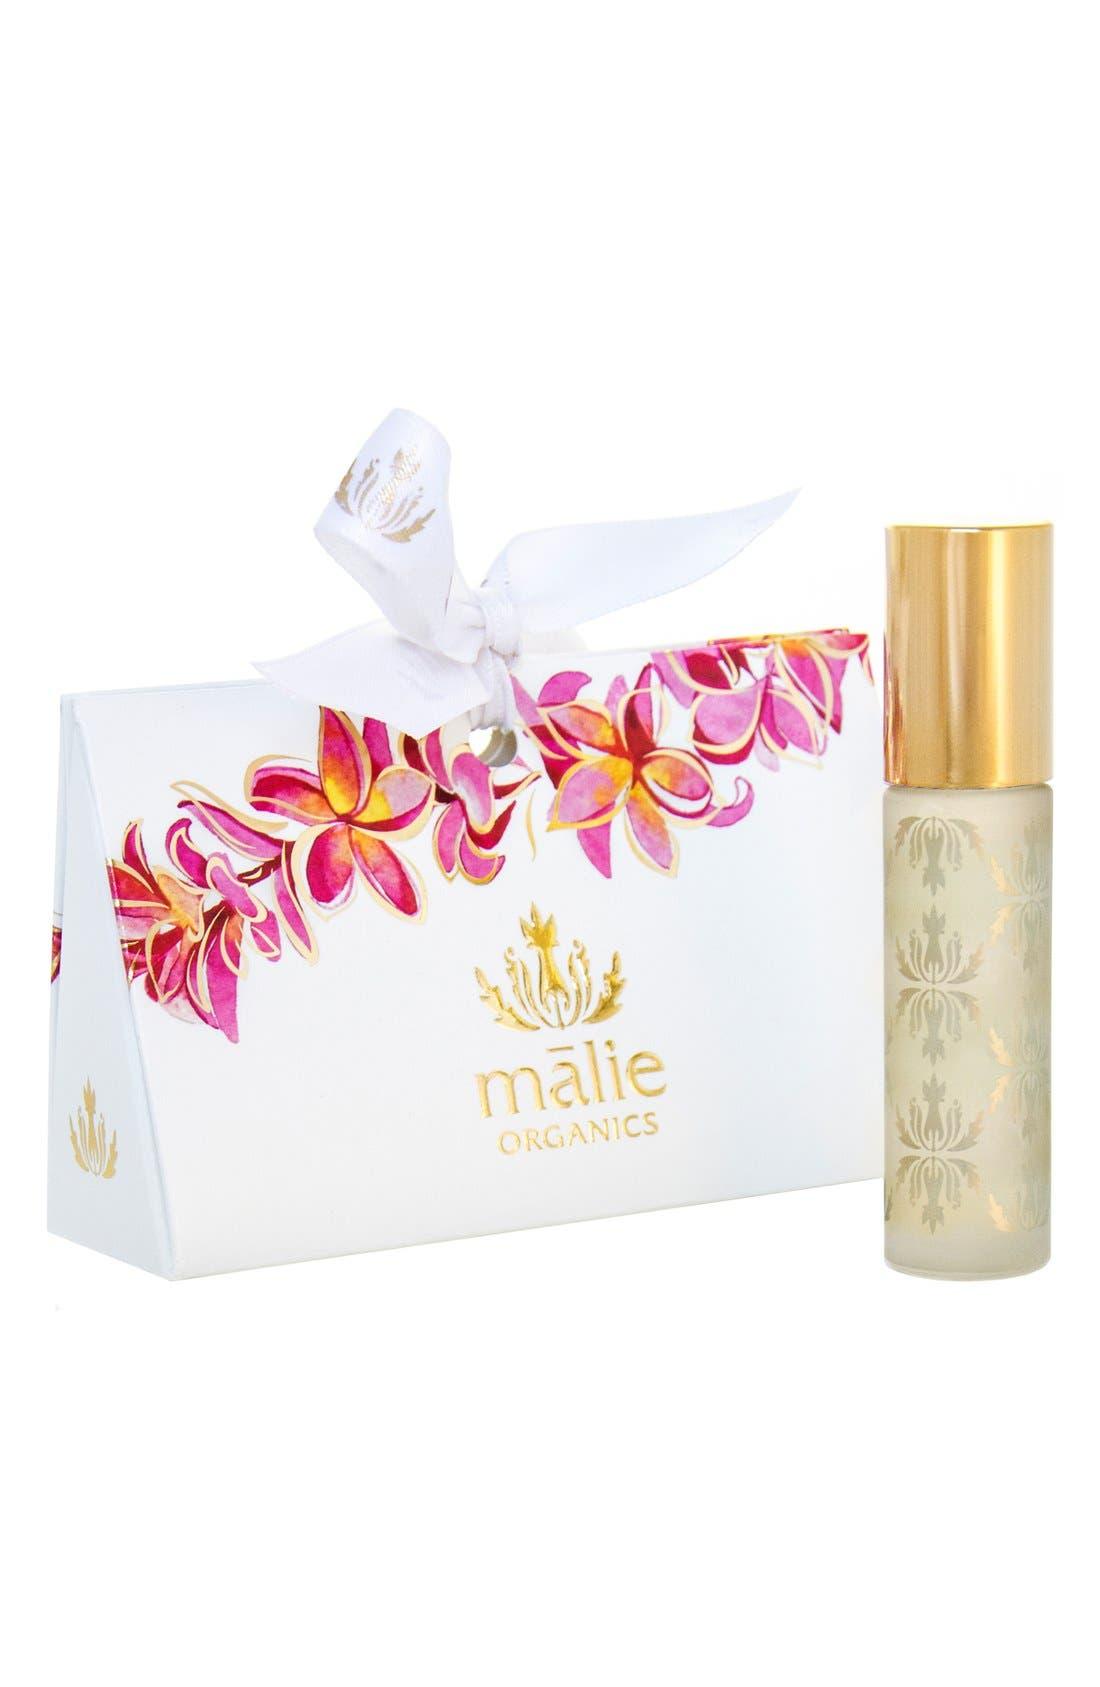 Plumeria Organic Roll-On Perfume Oil,                         Main,                         color,